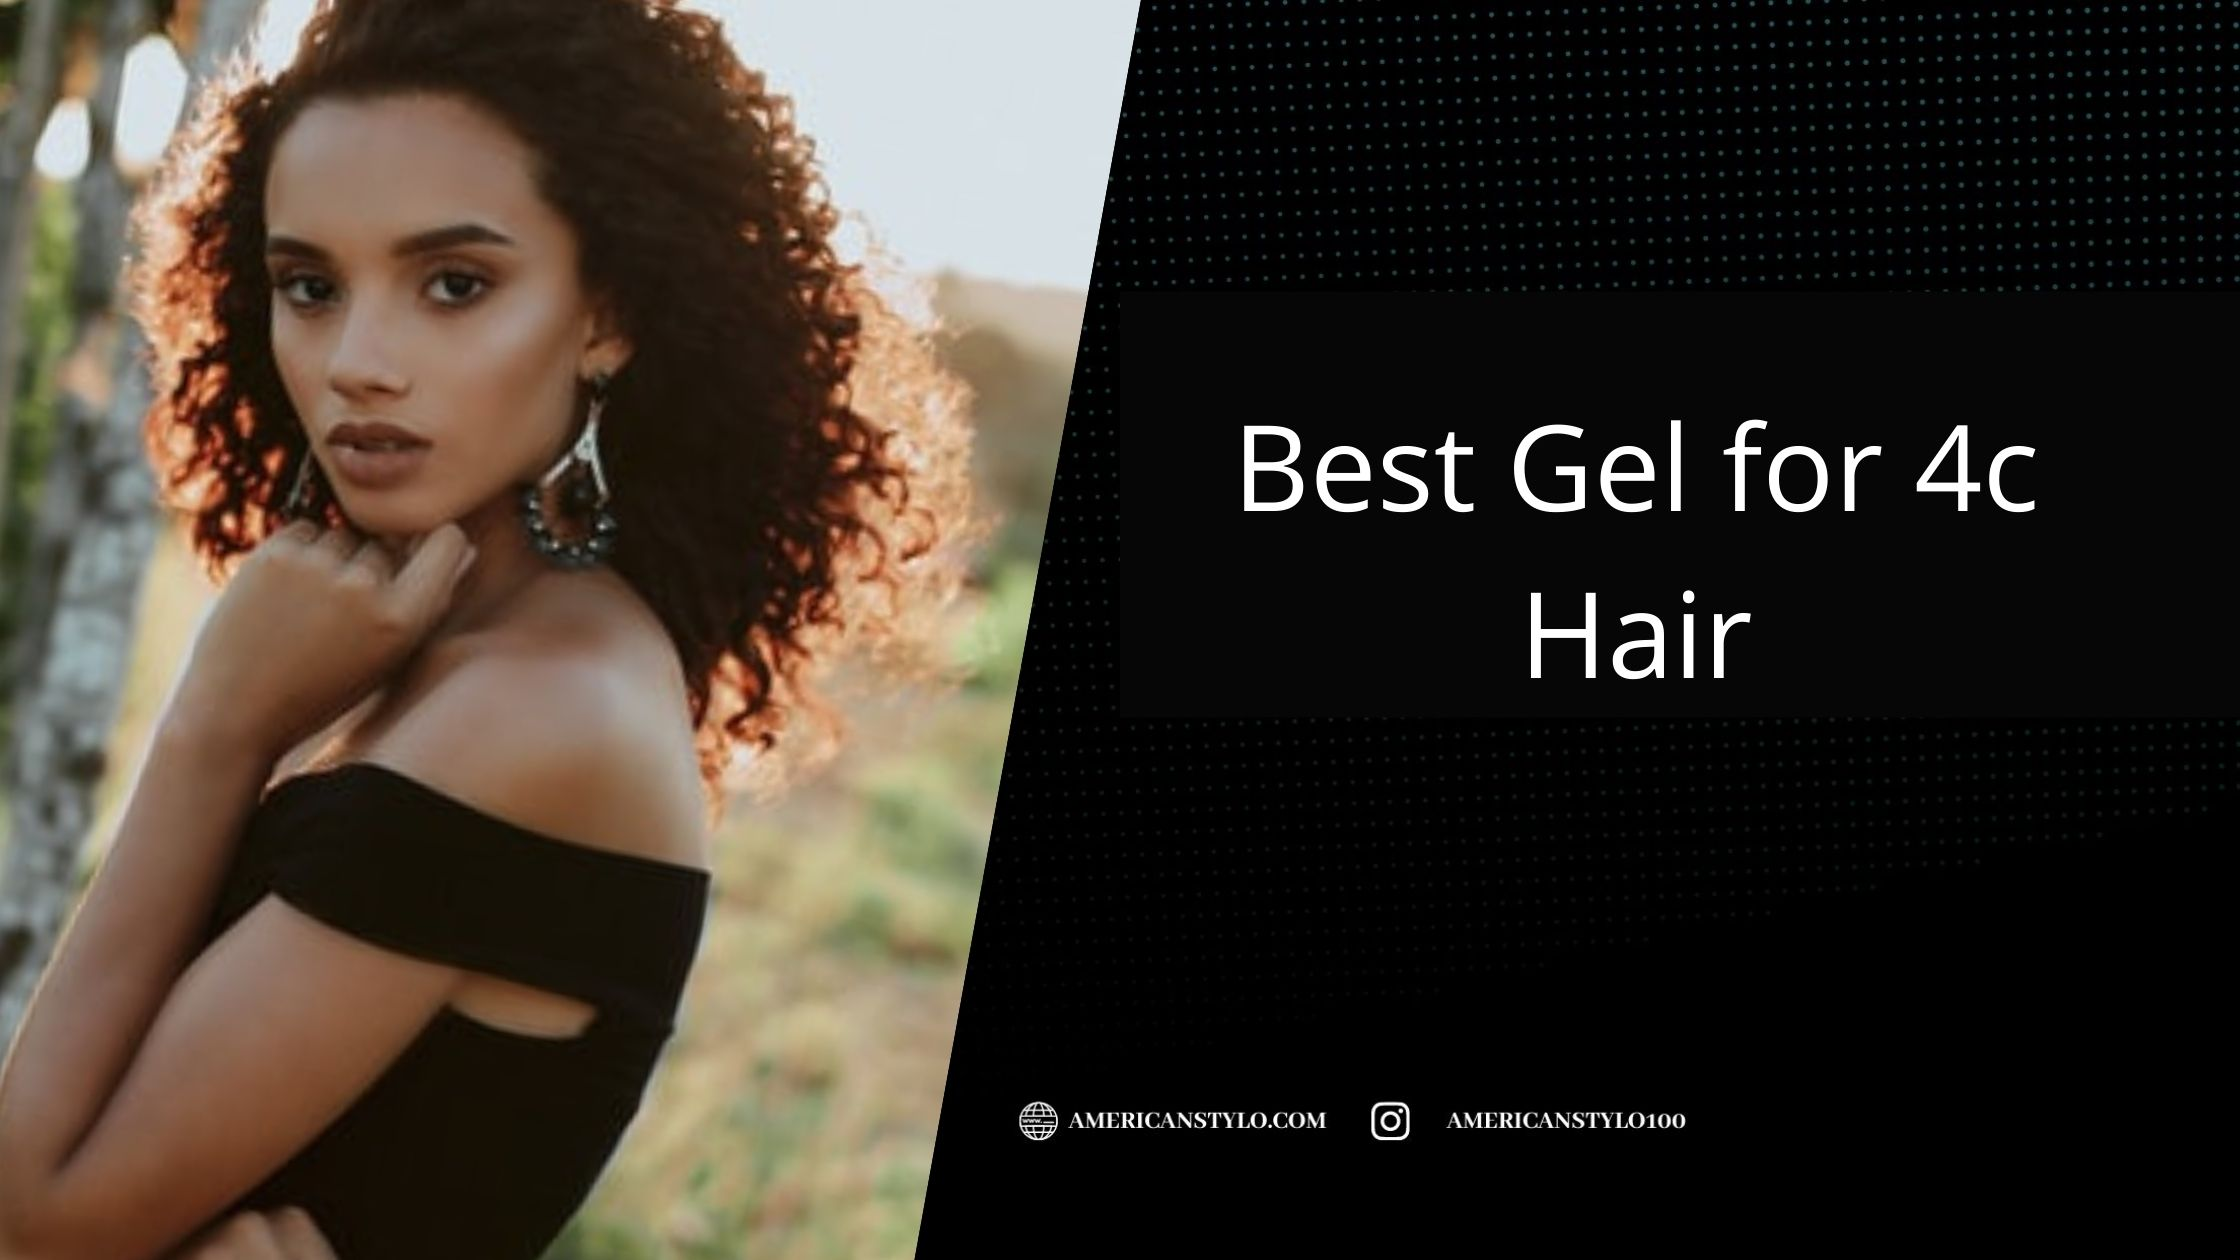 Best Gel for 4c Hair